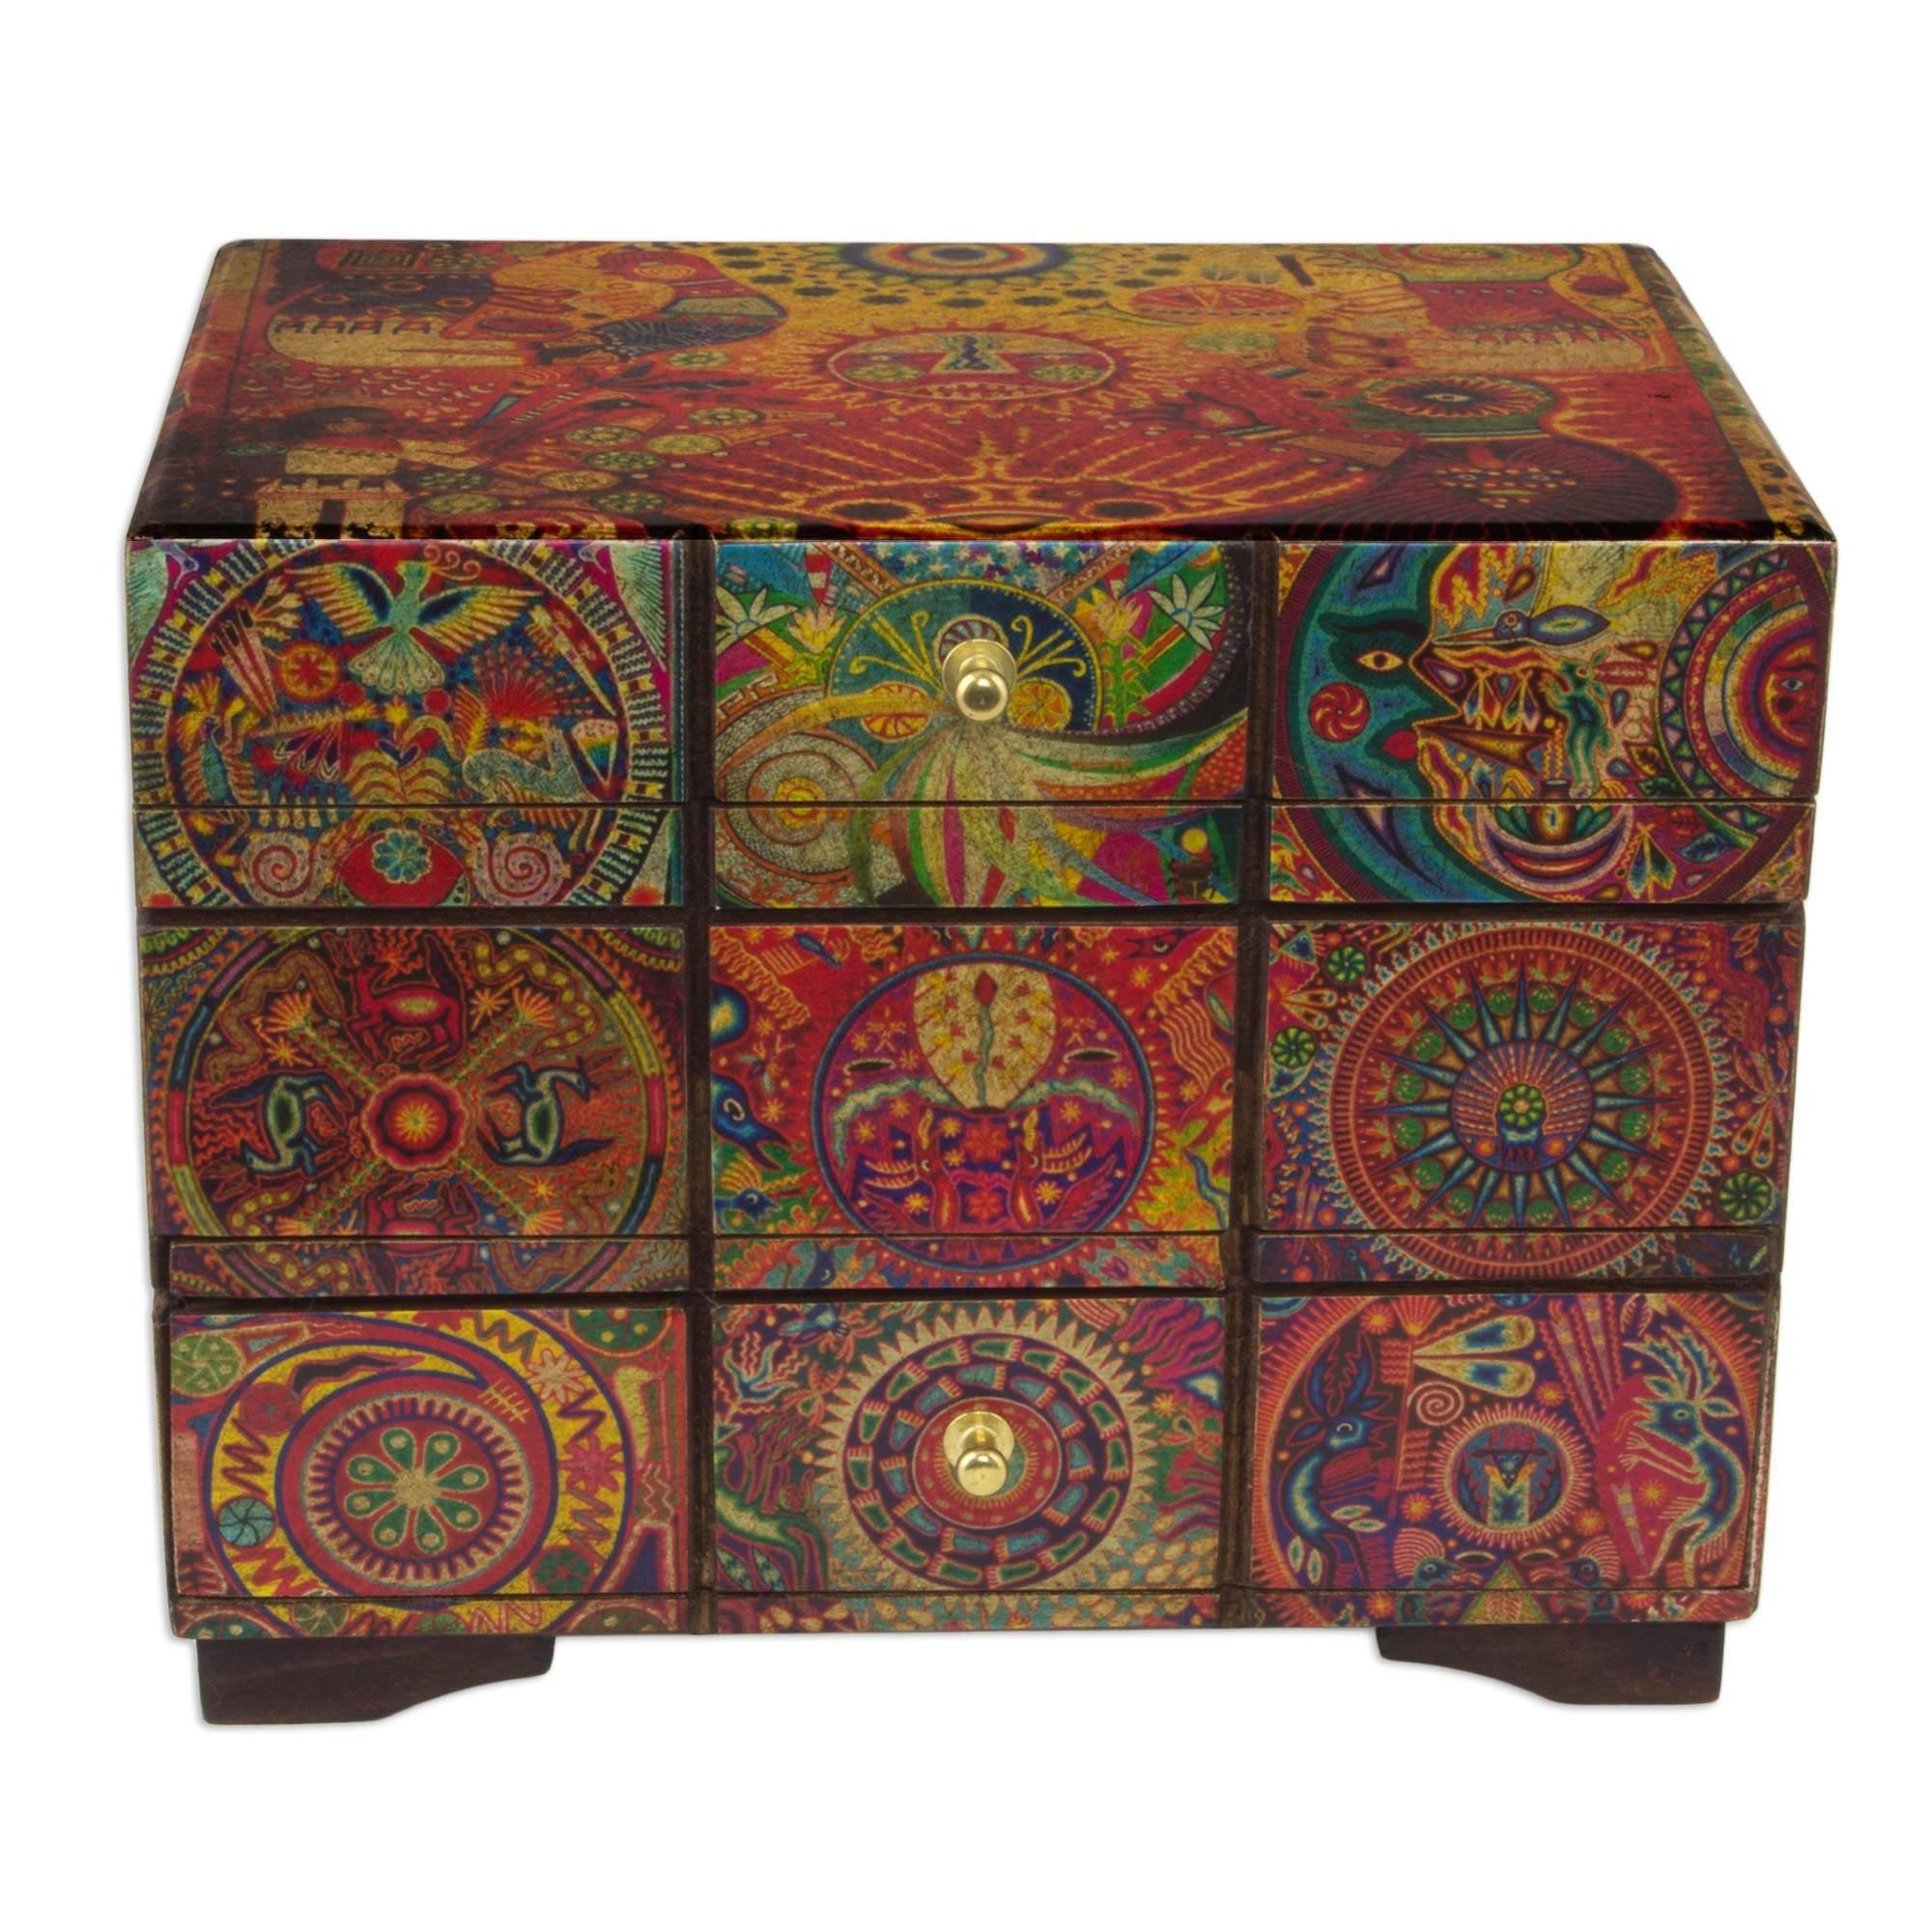 NOVICA 256493 Huichol Portal' Decoupage Jewelry Box by NOVICA